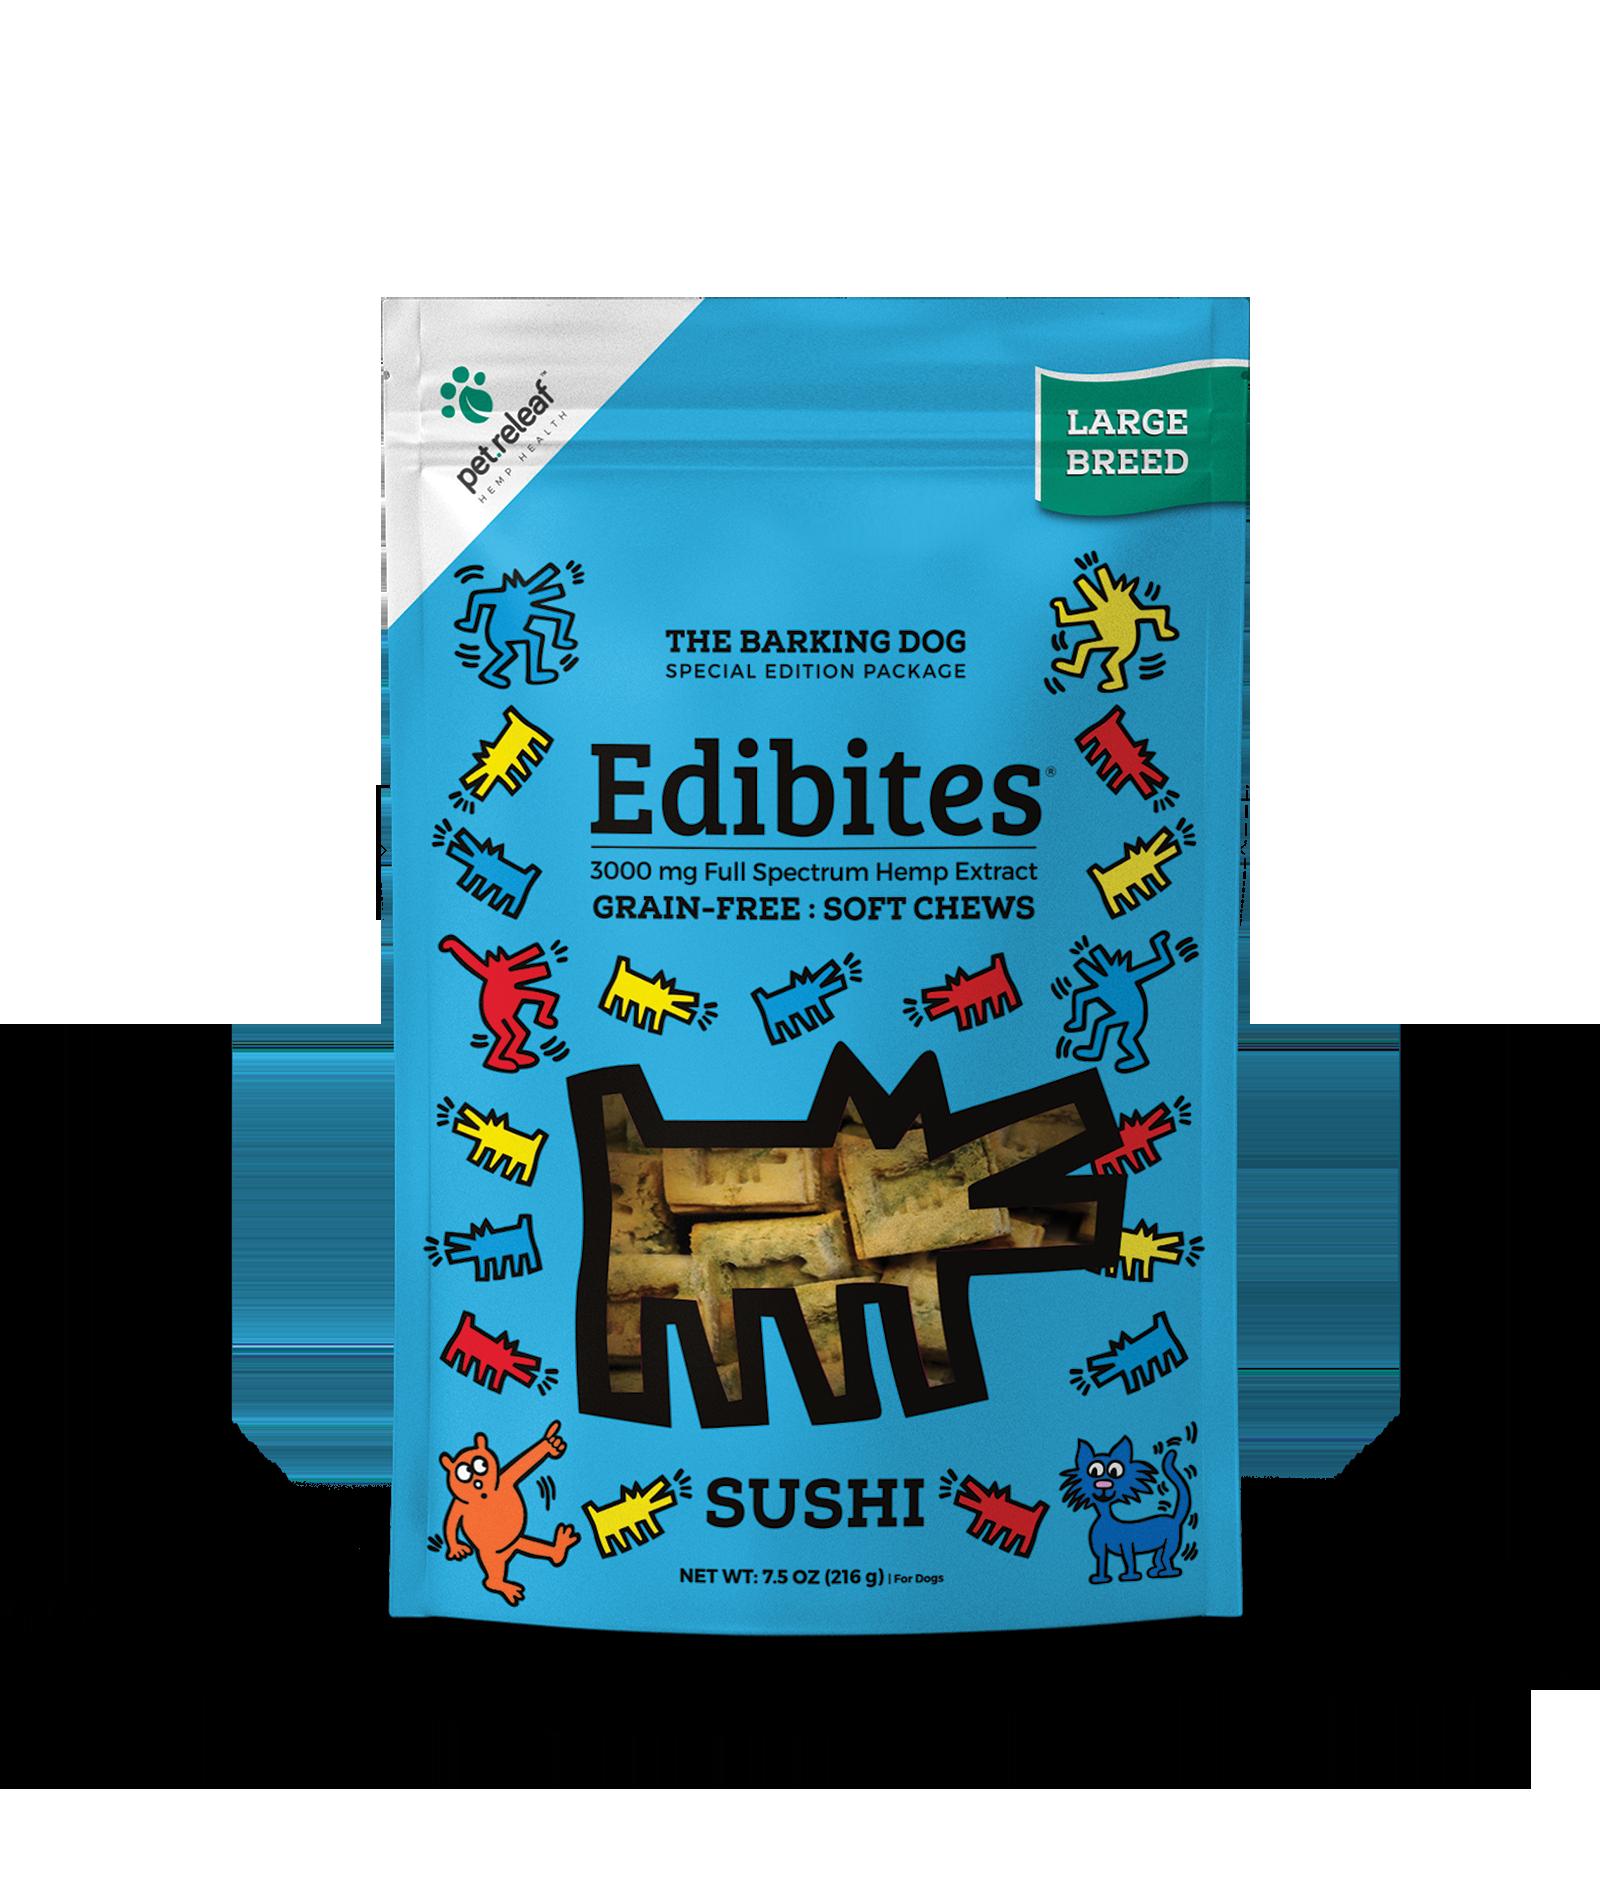 Pet Releaf Edibites Soft Chews Sushi Large Breed Dog Supplement, 3000mg, 7.5-oz